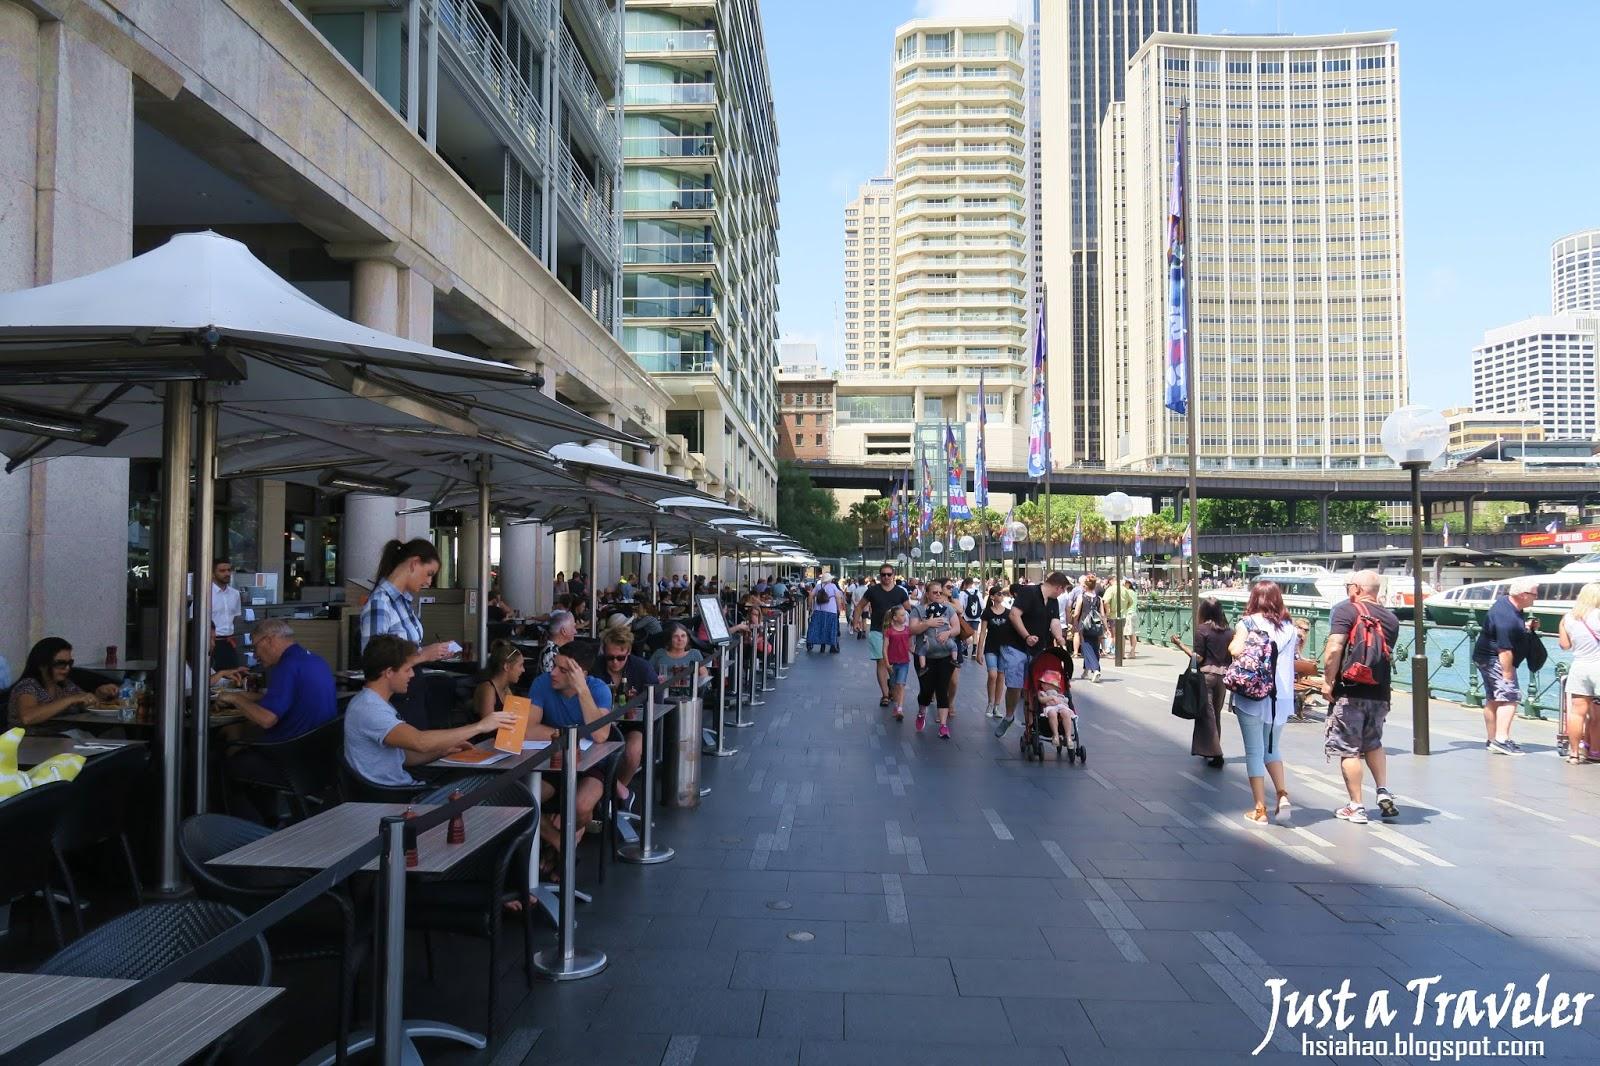 雪梨-景點-推薦-歌劇院-Opera-House-美食-旅遊-自由行-澳洲-Sydney-Tourist-Attraction-Travel-Australia